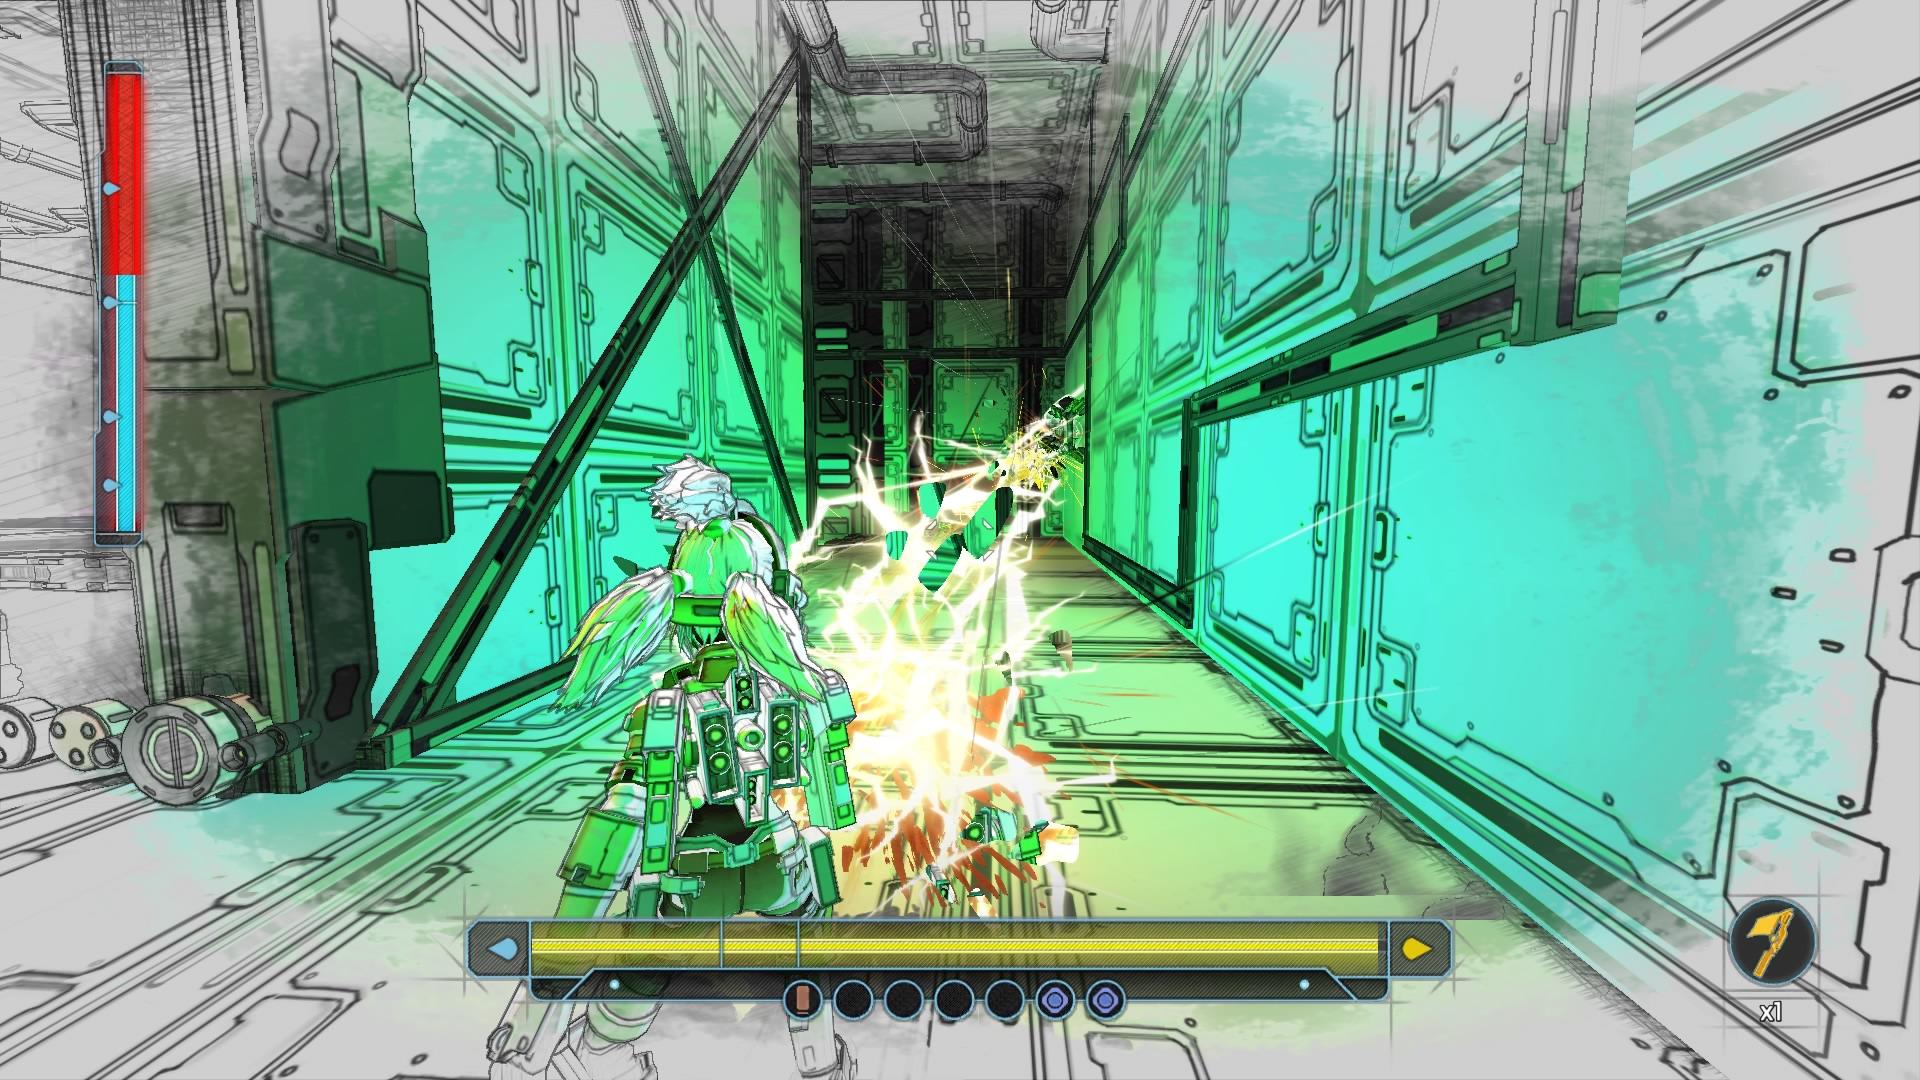 Game Hype - Super CloudBuilt